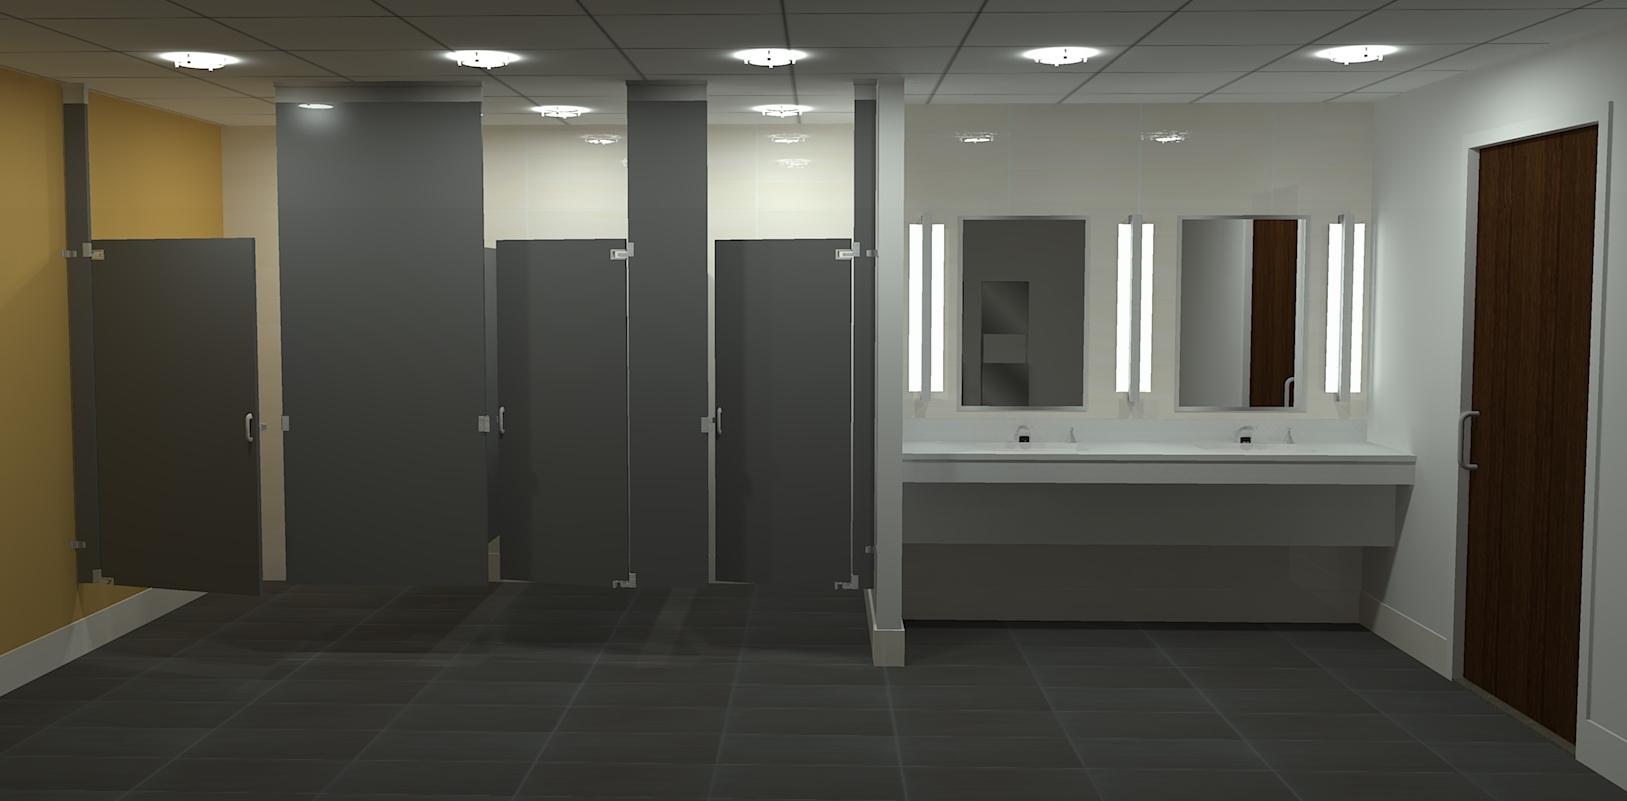 8520 Corridor Restroom Render 1 140718.jpg